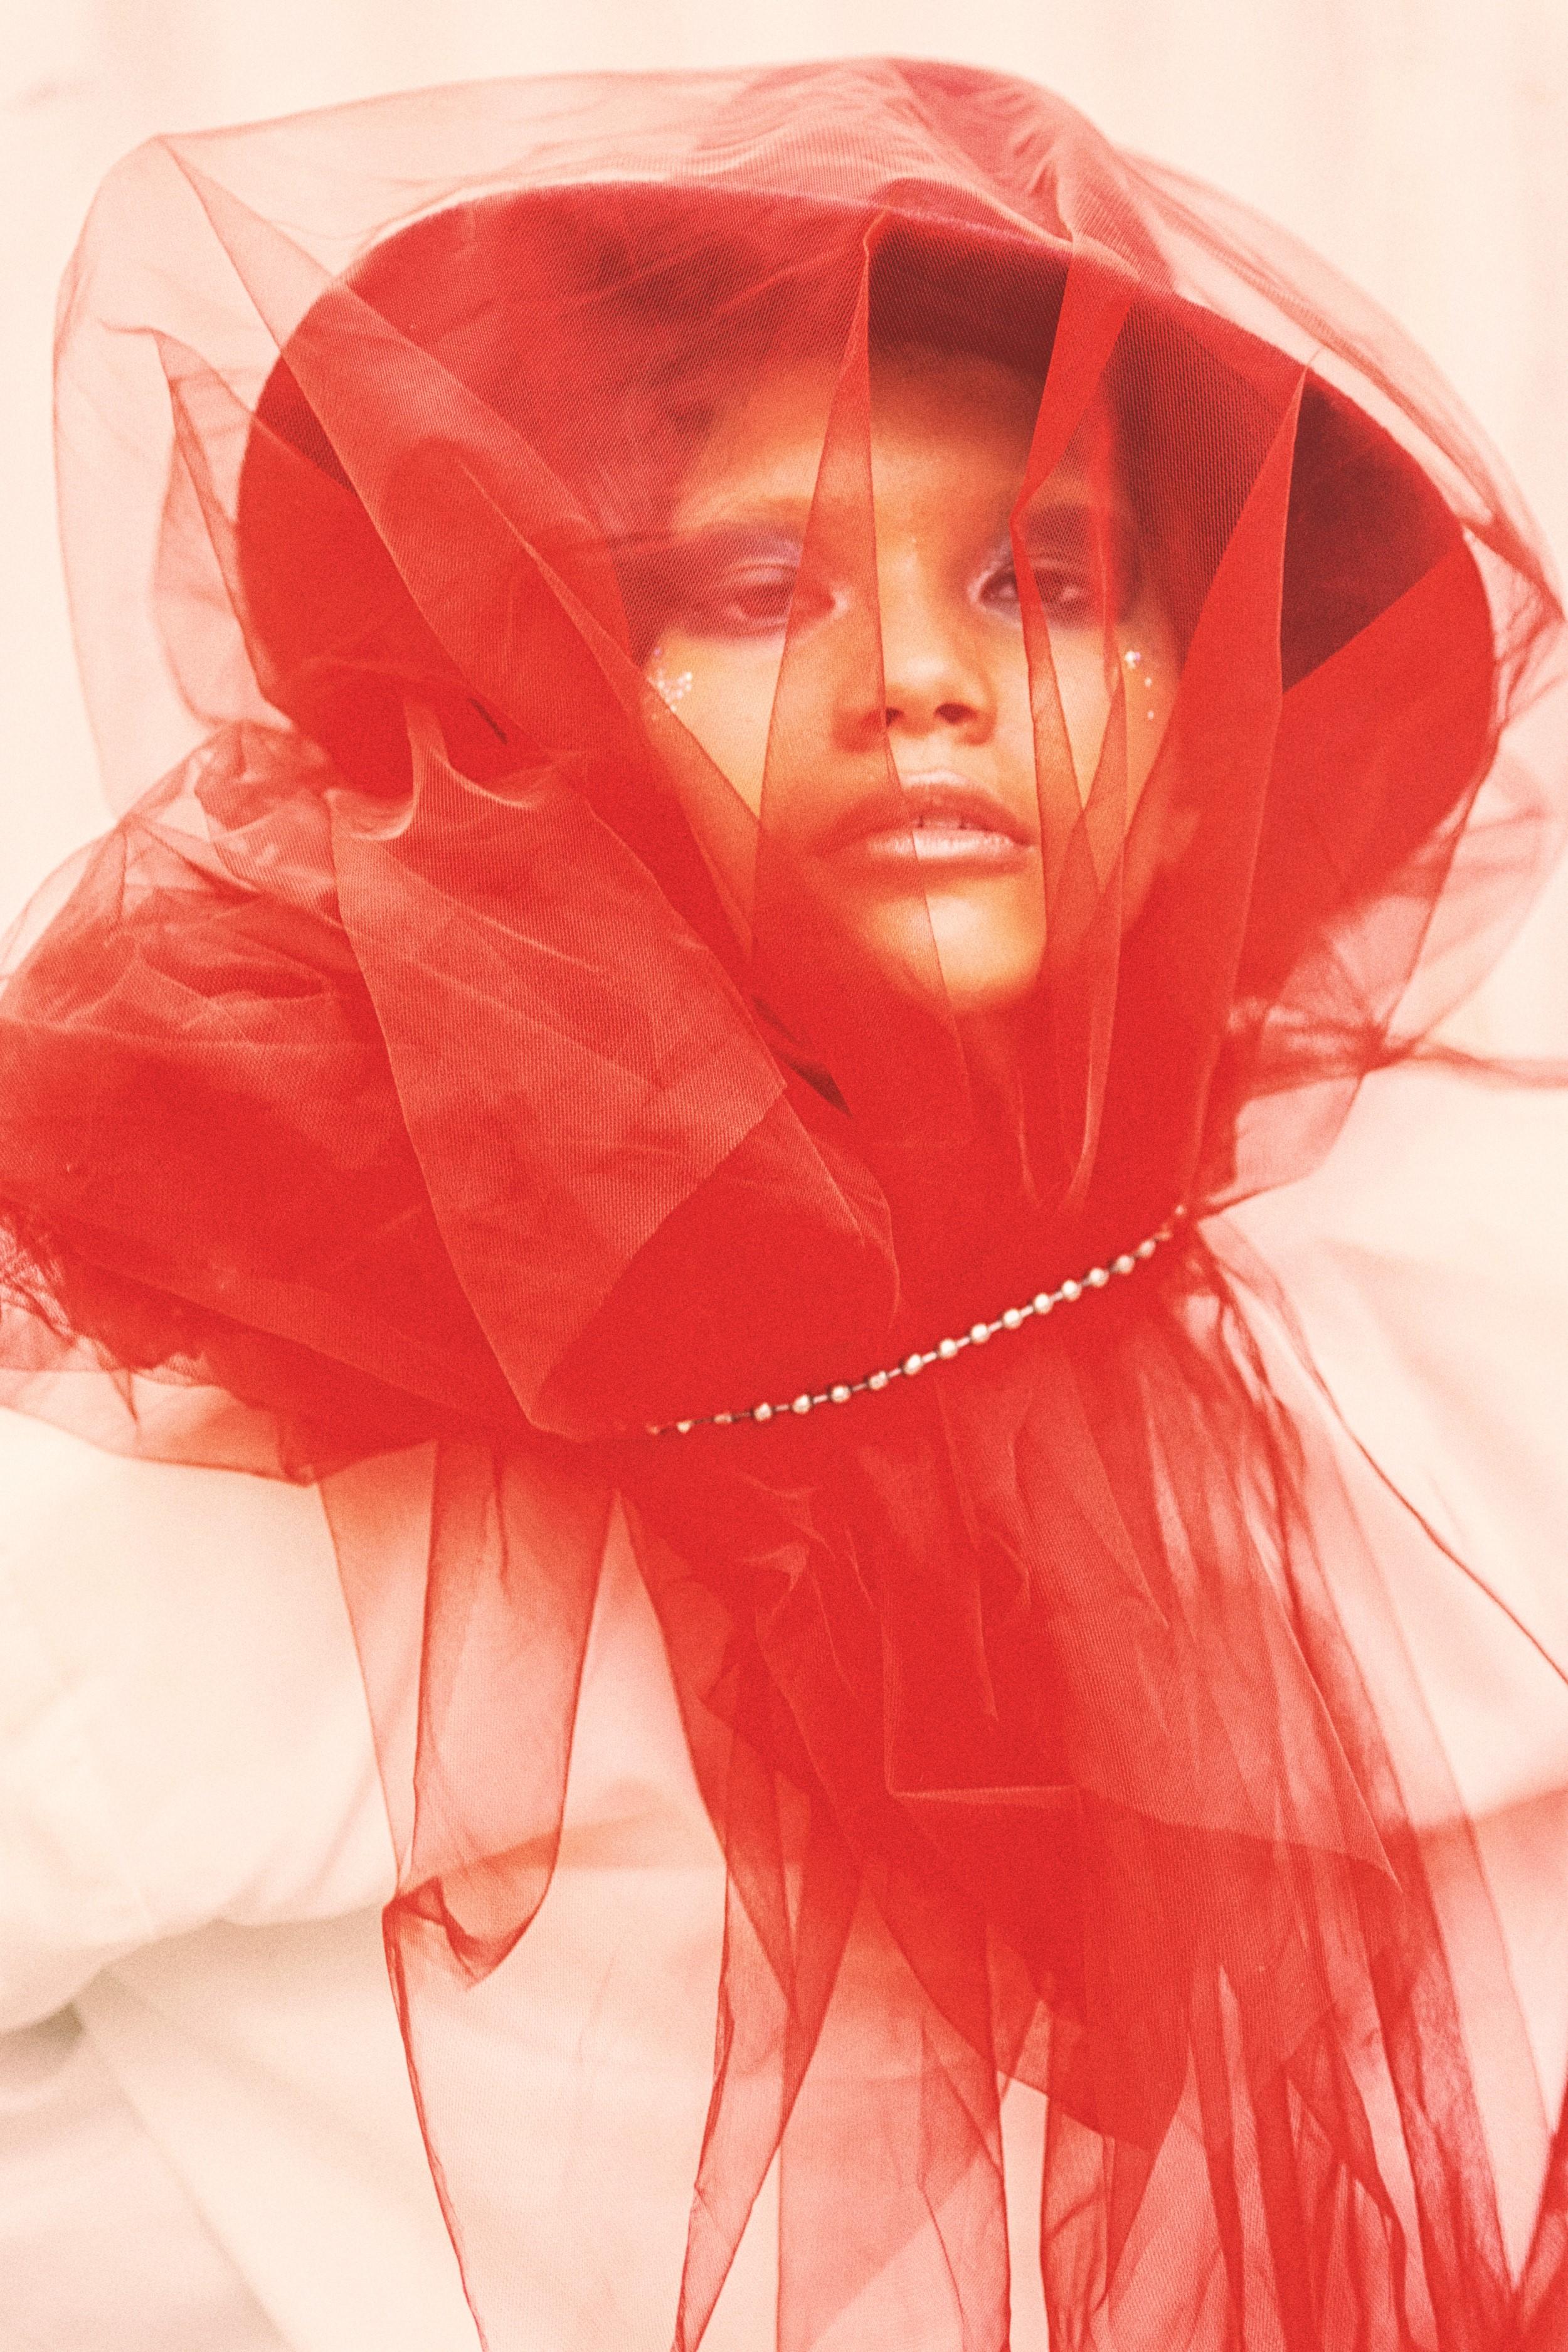 Indonesian Photographer Bintang Adamas 'Shakira' Series for Through the Photographer's Lens, Globetroter Magazine (04).jpg